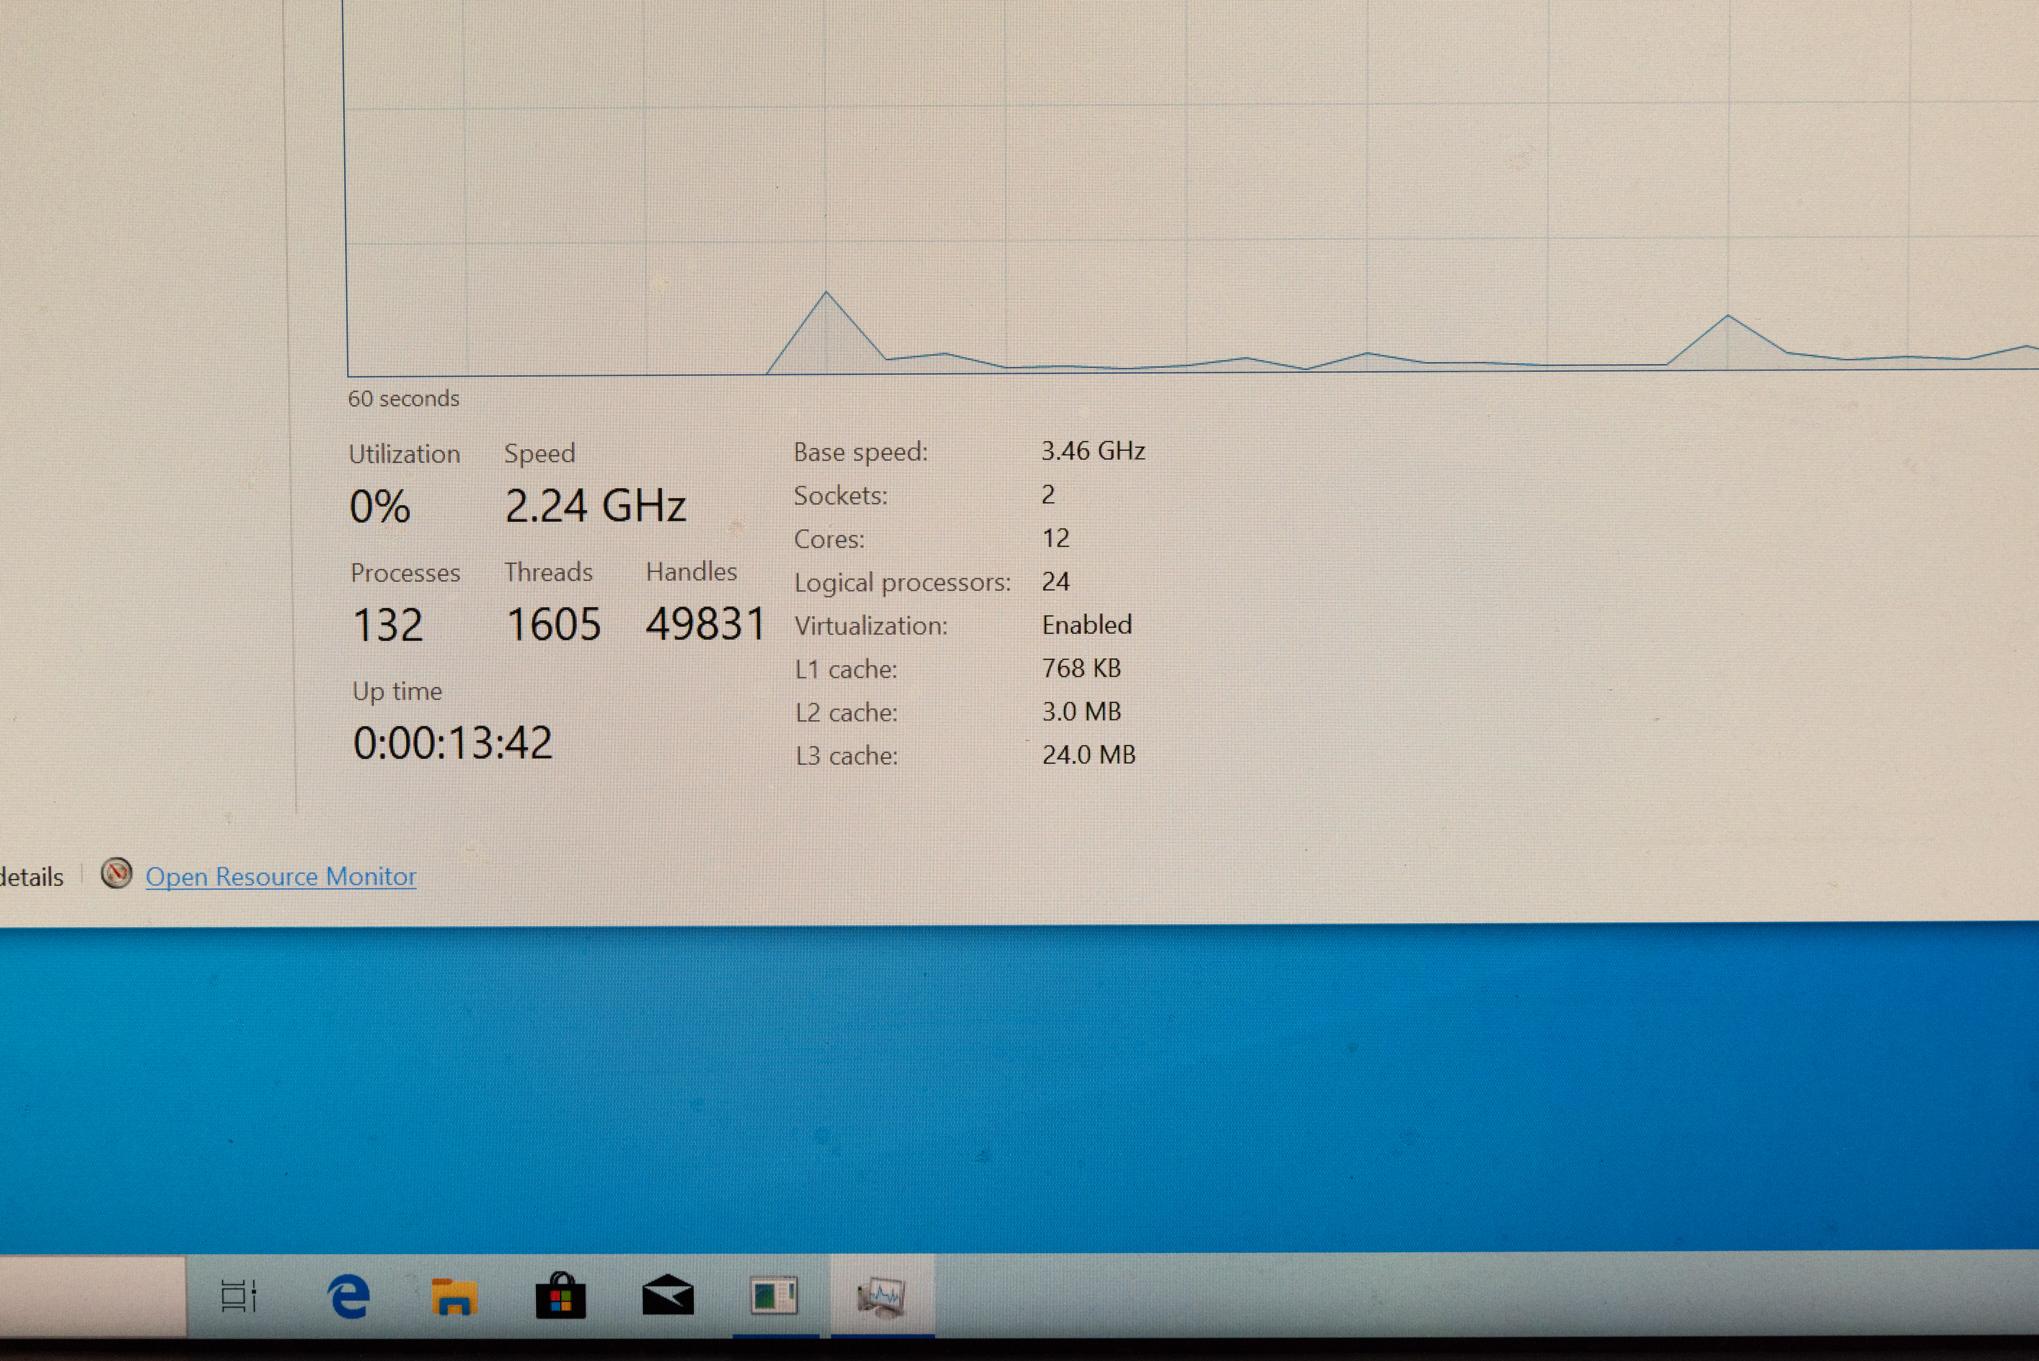 Z800 Dual Intel Xeon 5590 3.46 GHZ